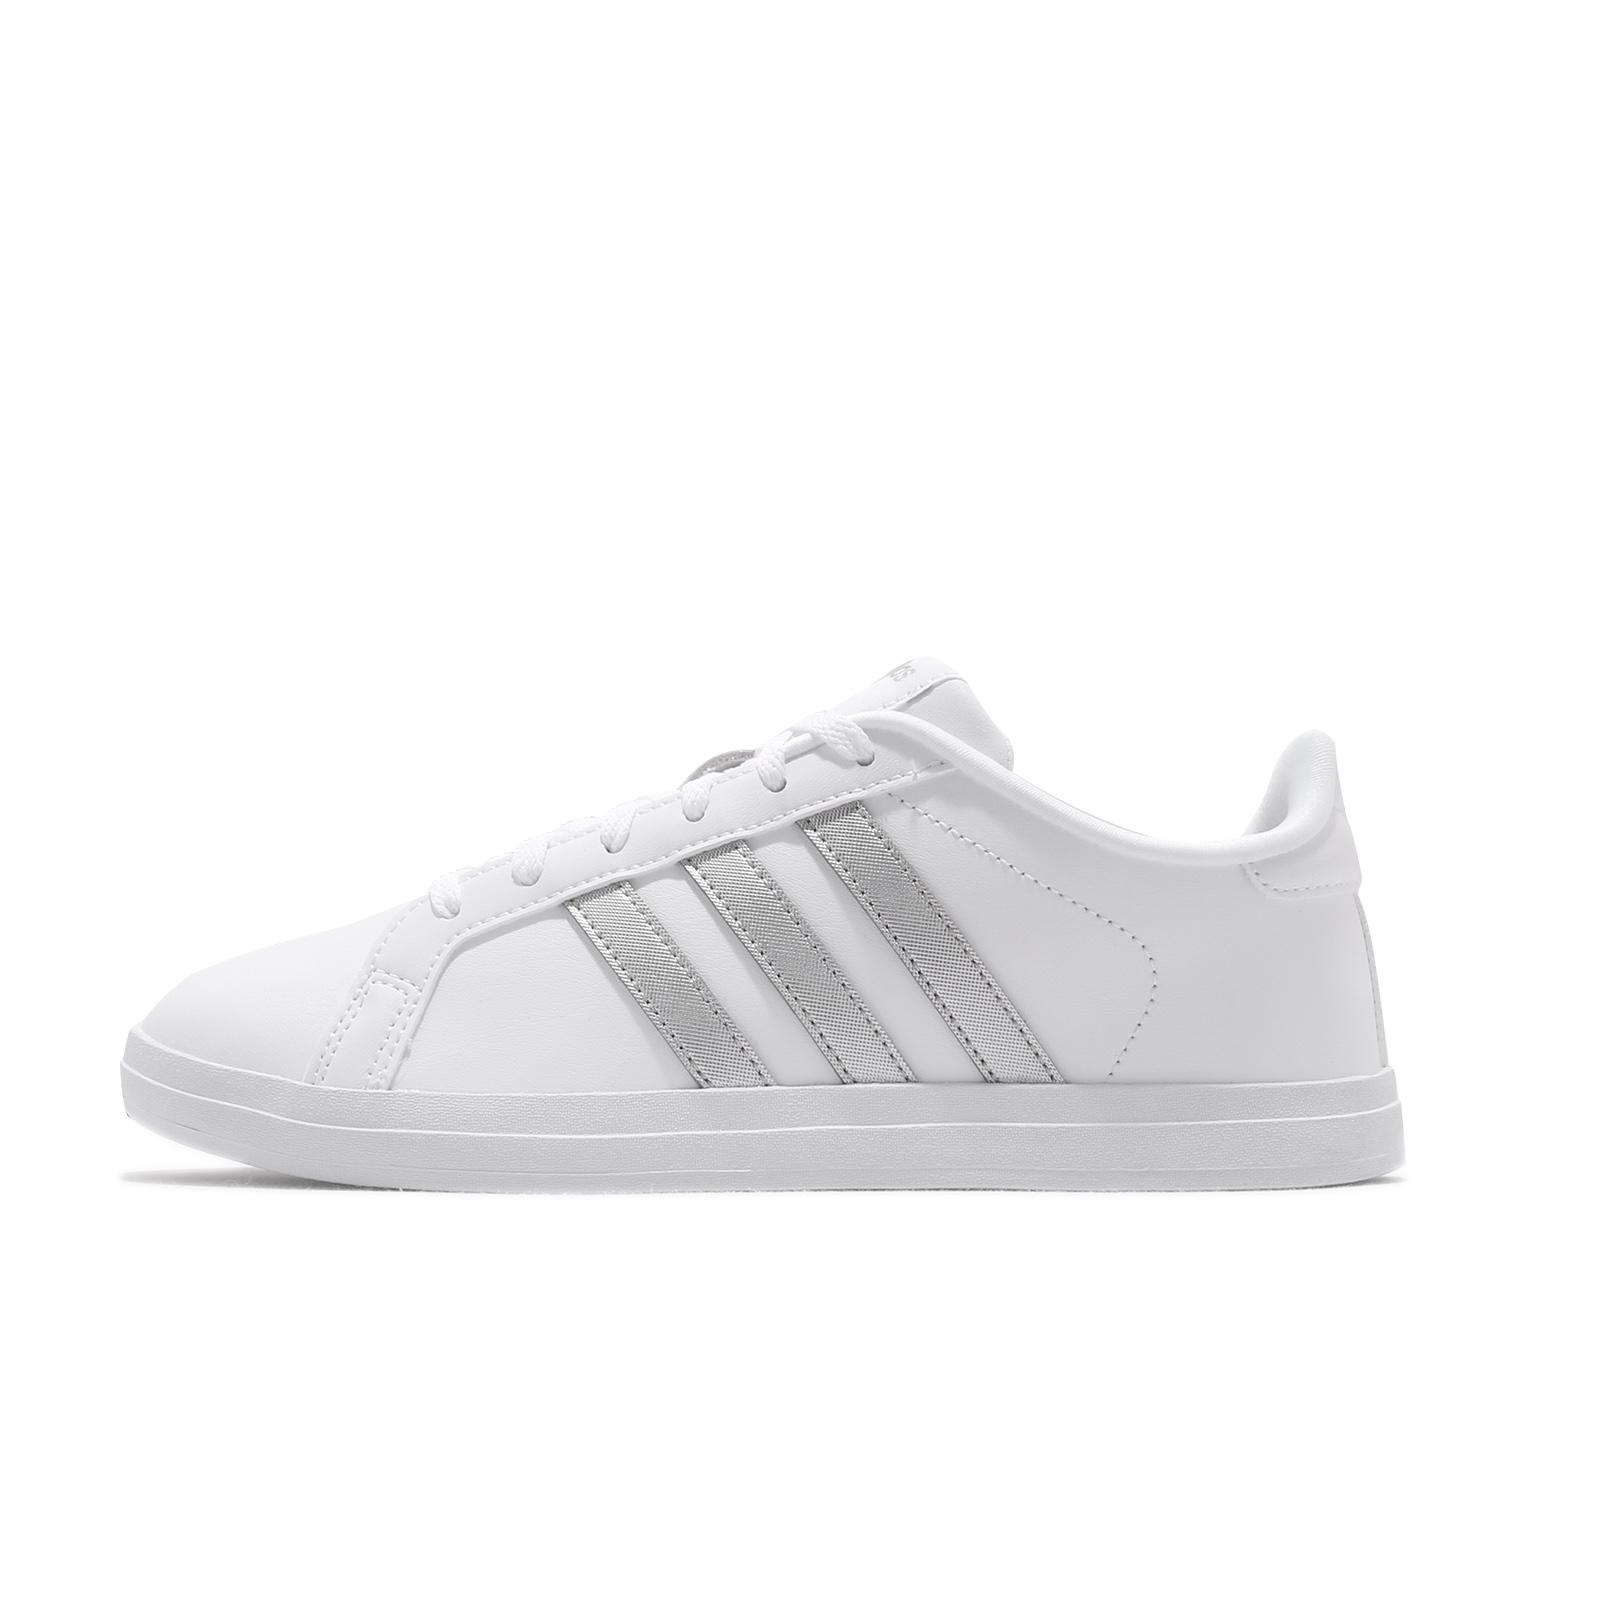 adidas 休閒鞋 Courtpoint 白 銀 愛迪達 小白鞋 女鞋 基本款 【ACS】 FW7376